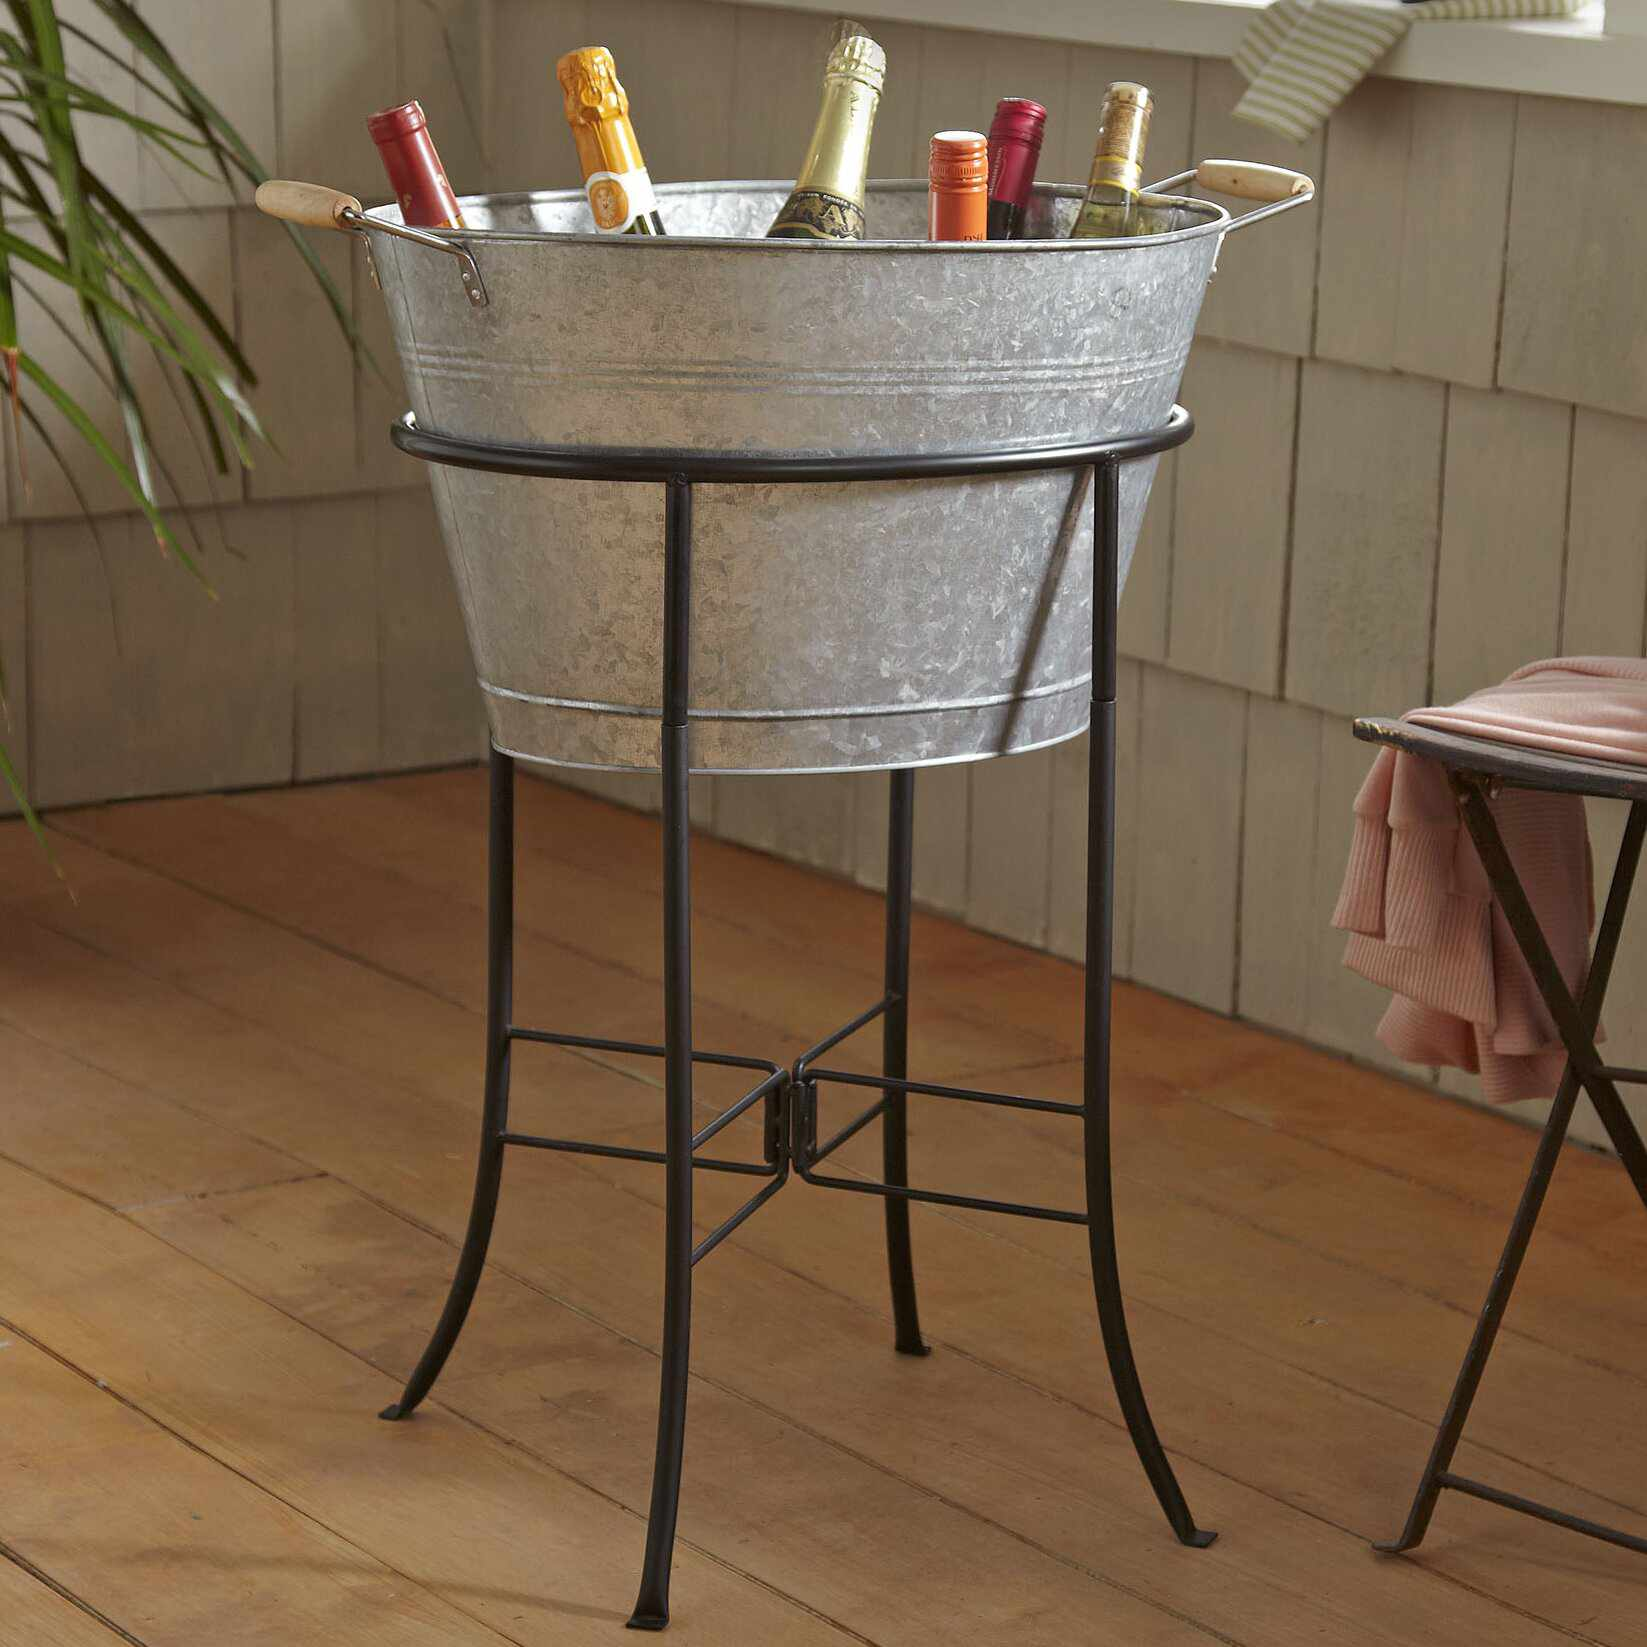 Hoyleton Beverage Tub with Stand